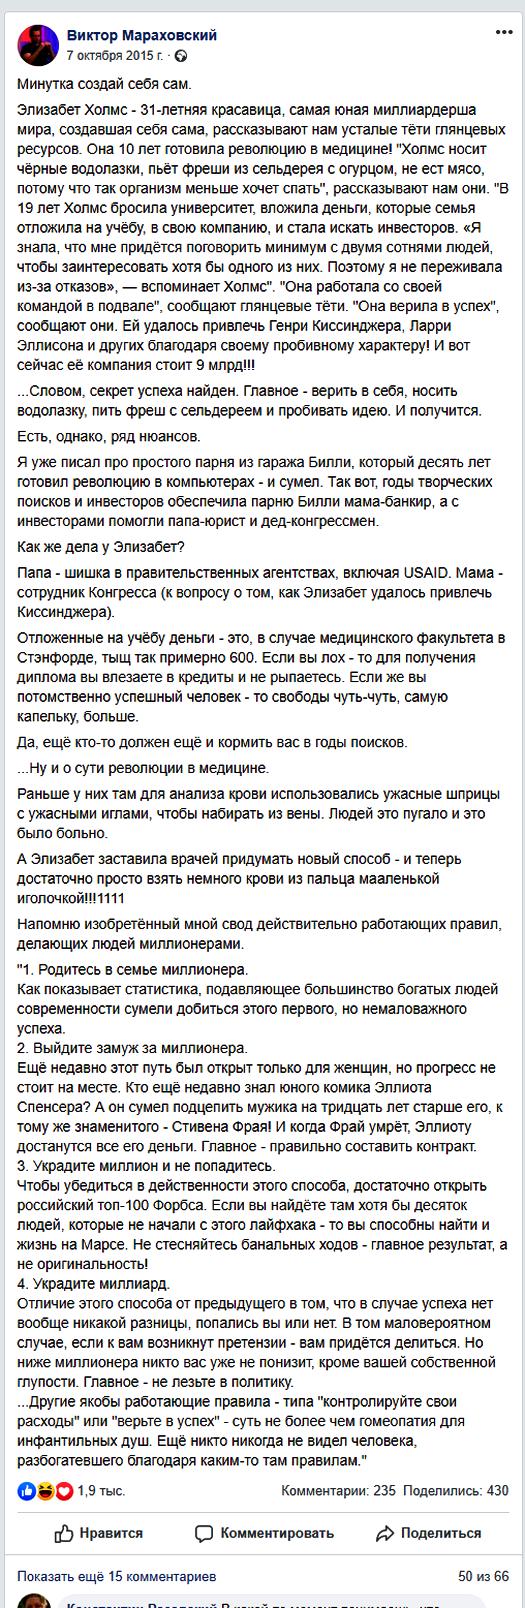 07_2015_10_07_marahovsky_FB